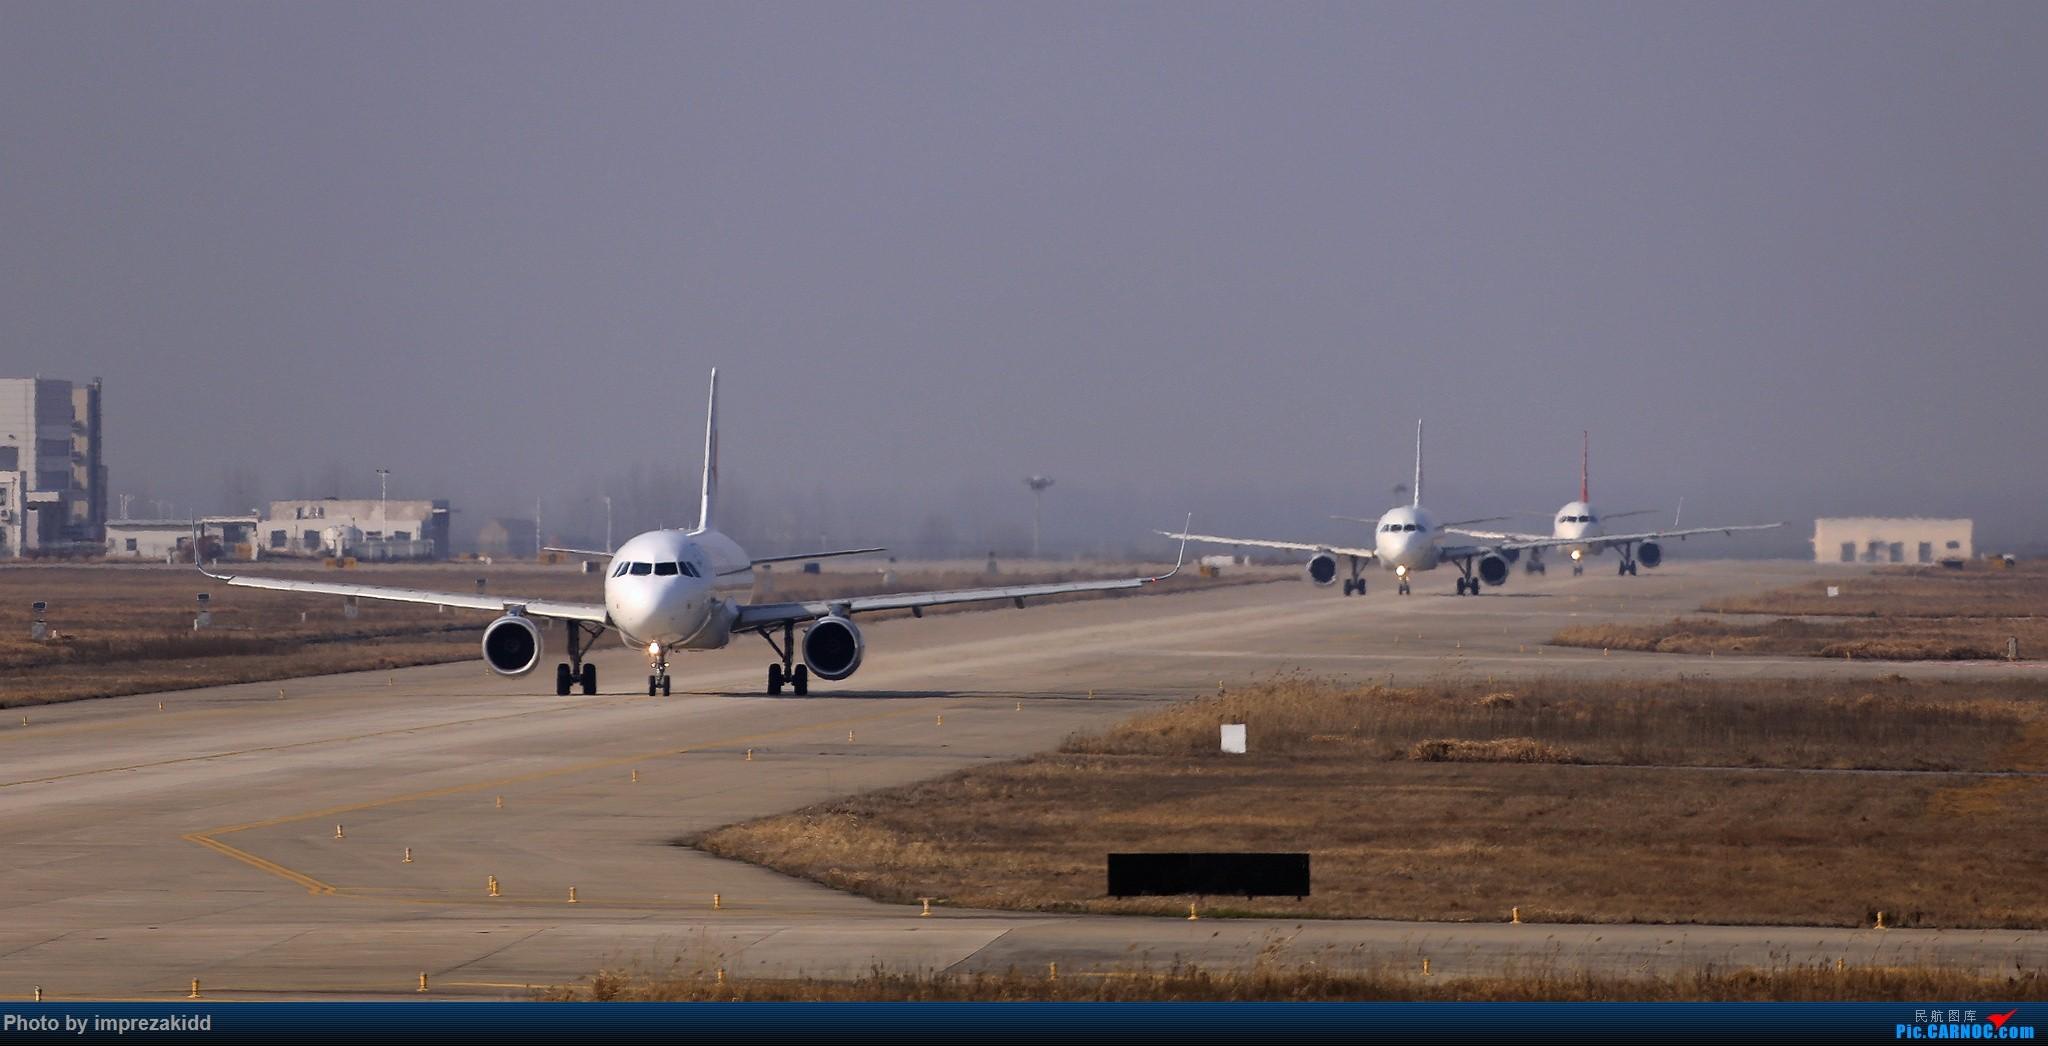 Re:【合肥飞友会·霸都打机队】又是一年拍机时《上半场》    中国合肥新桥国际机场